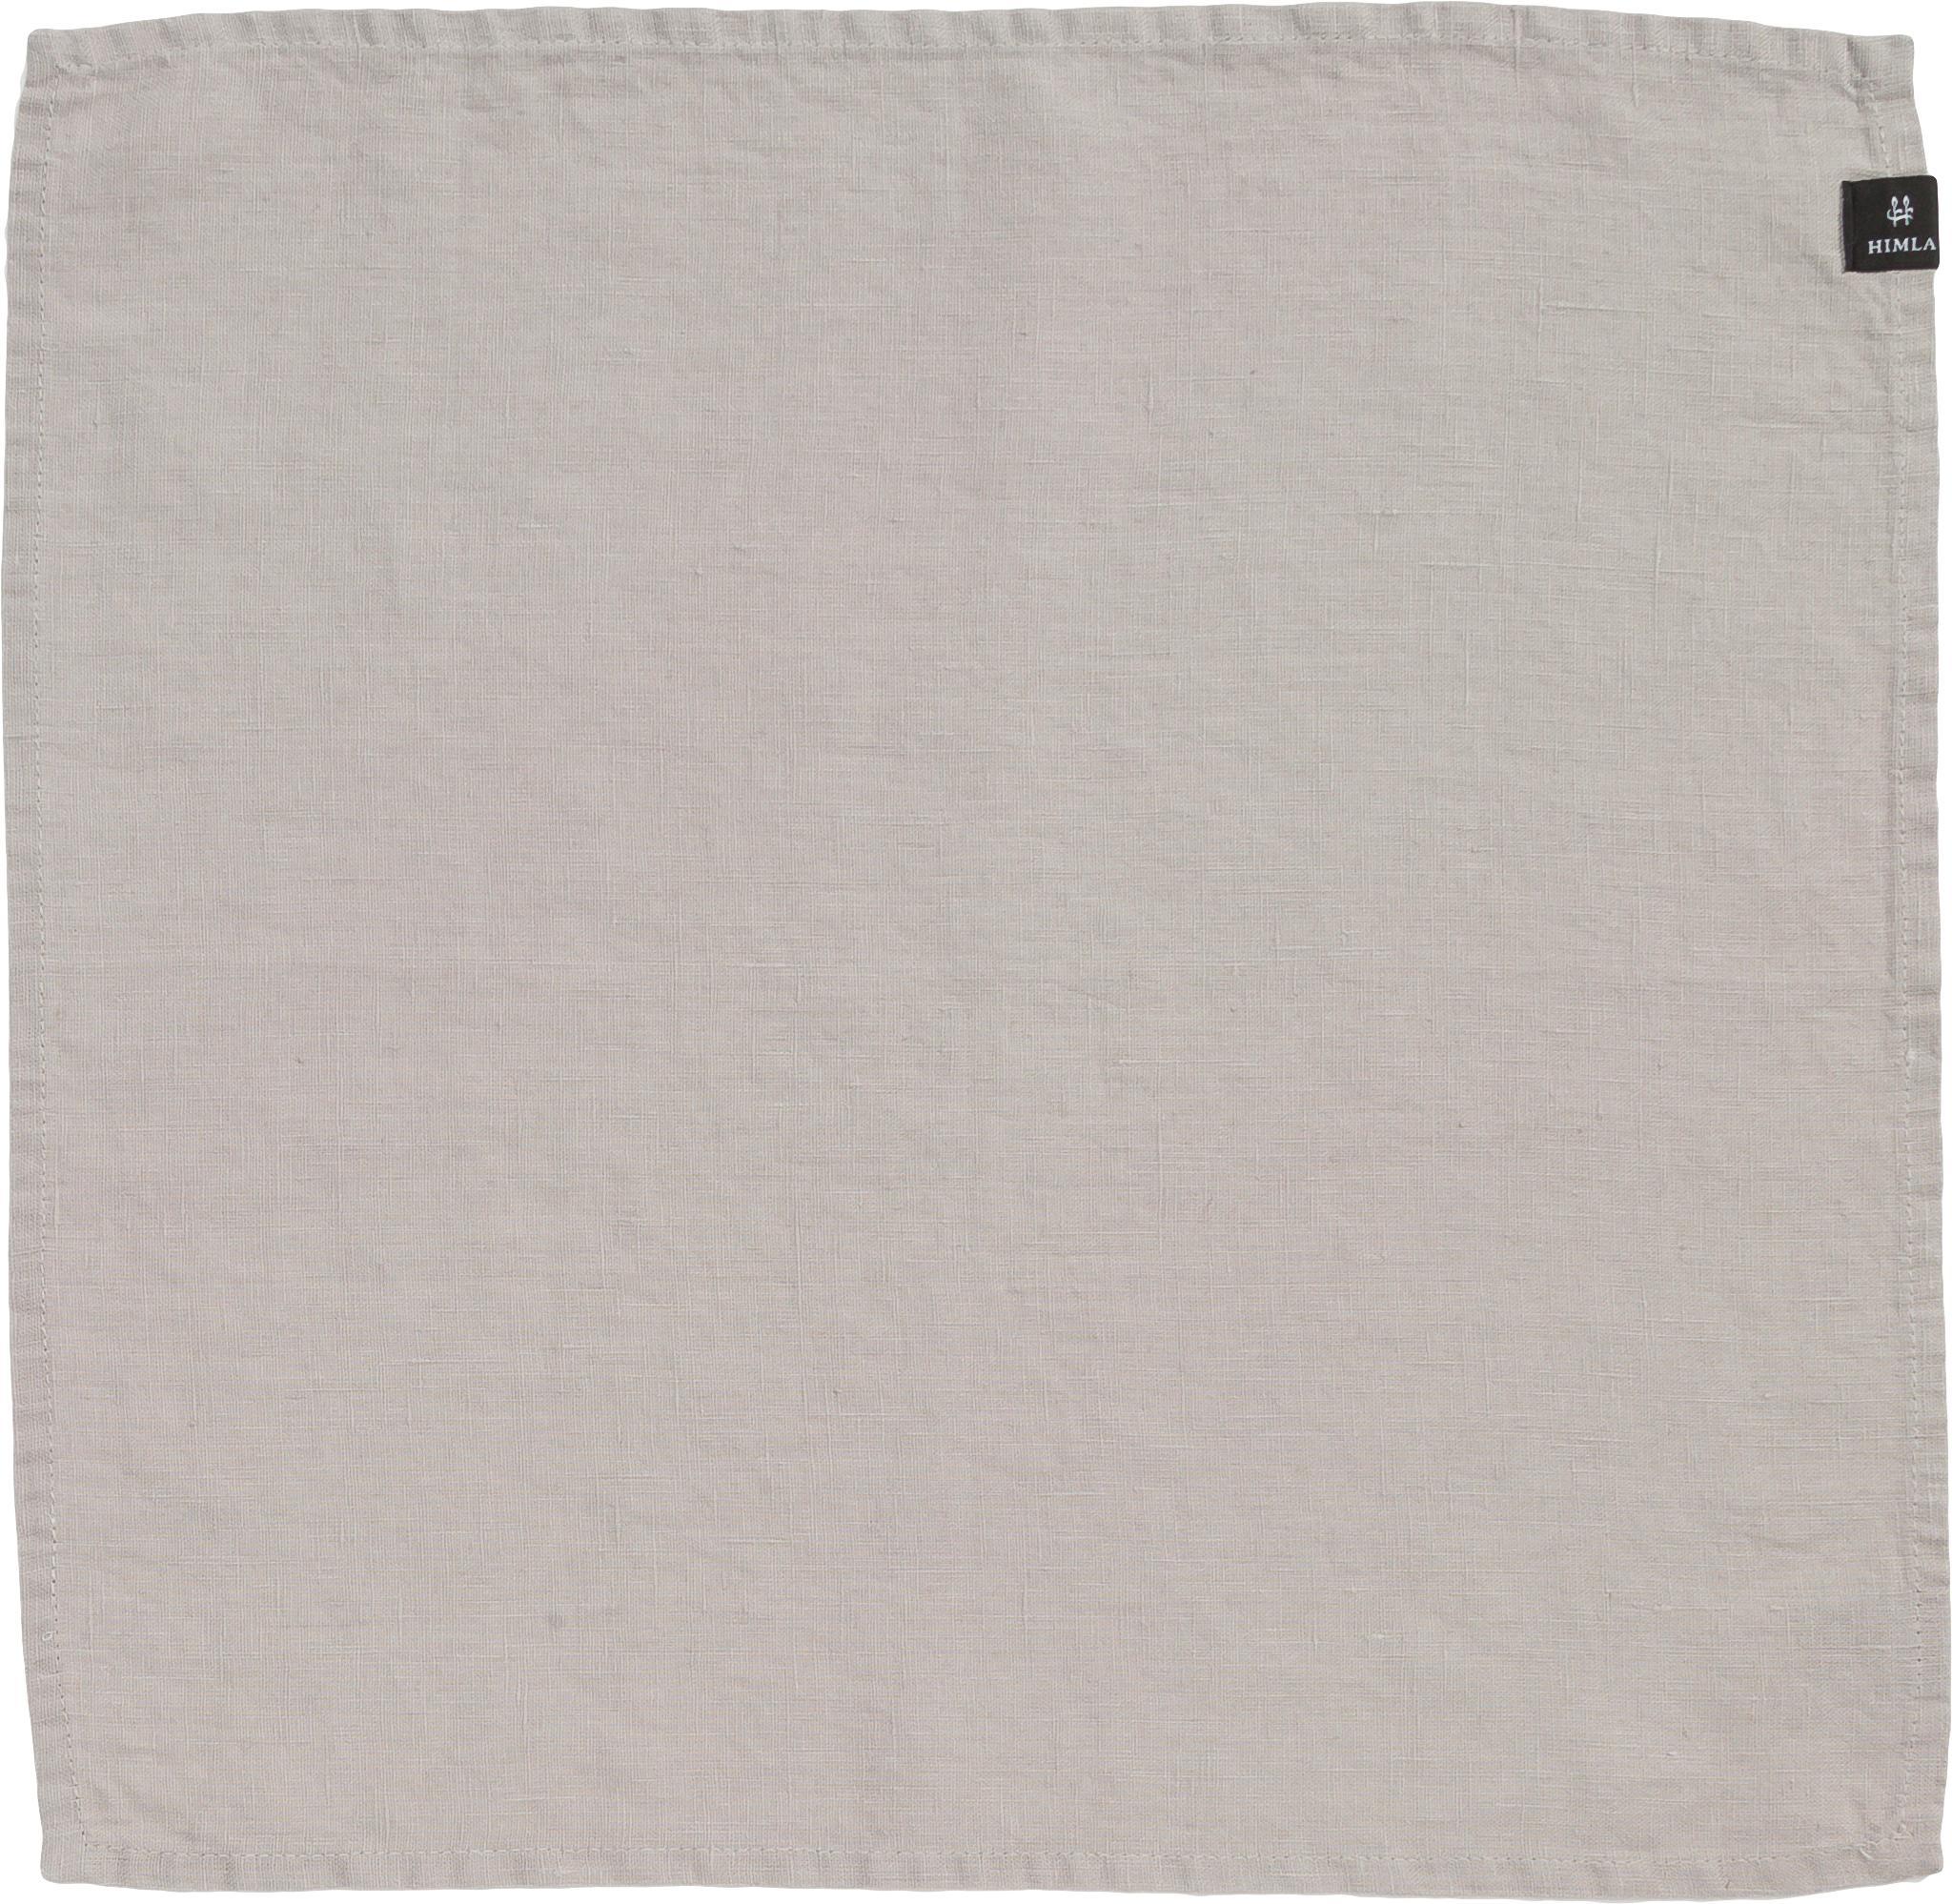 Servilletas de lino Sunshine, 4uds., 50%lino, 50%algodón, Blanco ceniza, L 45 x An 45 cm